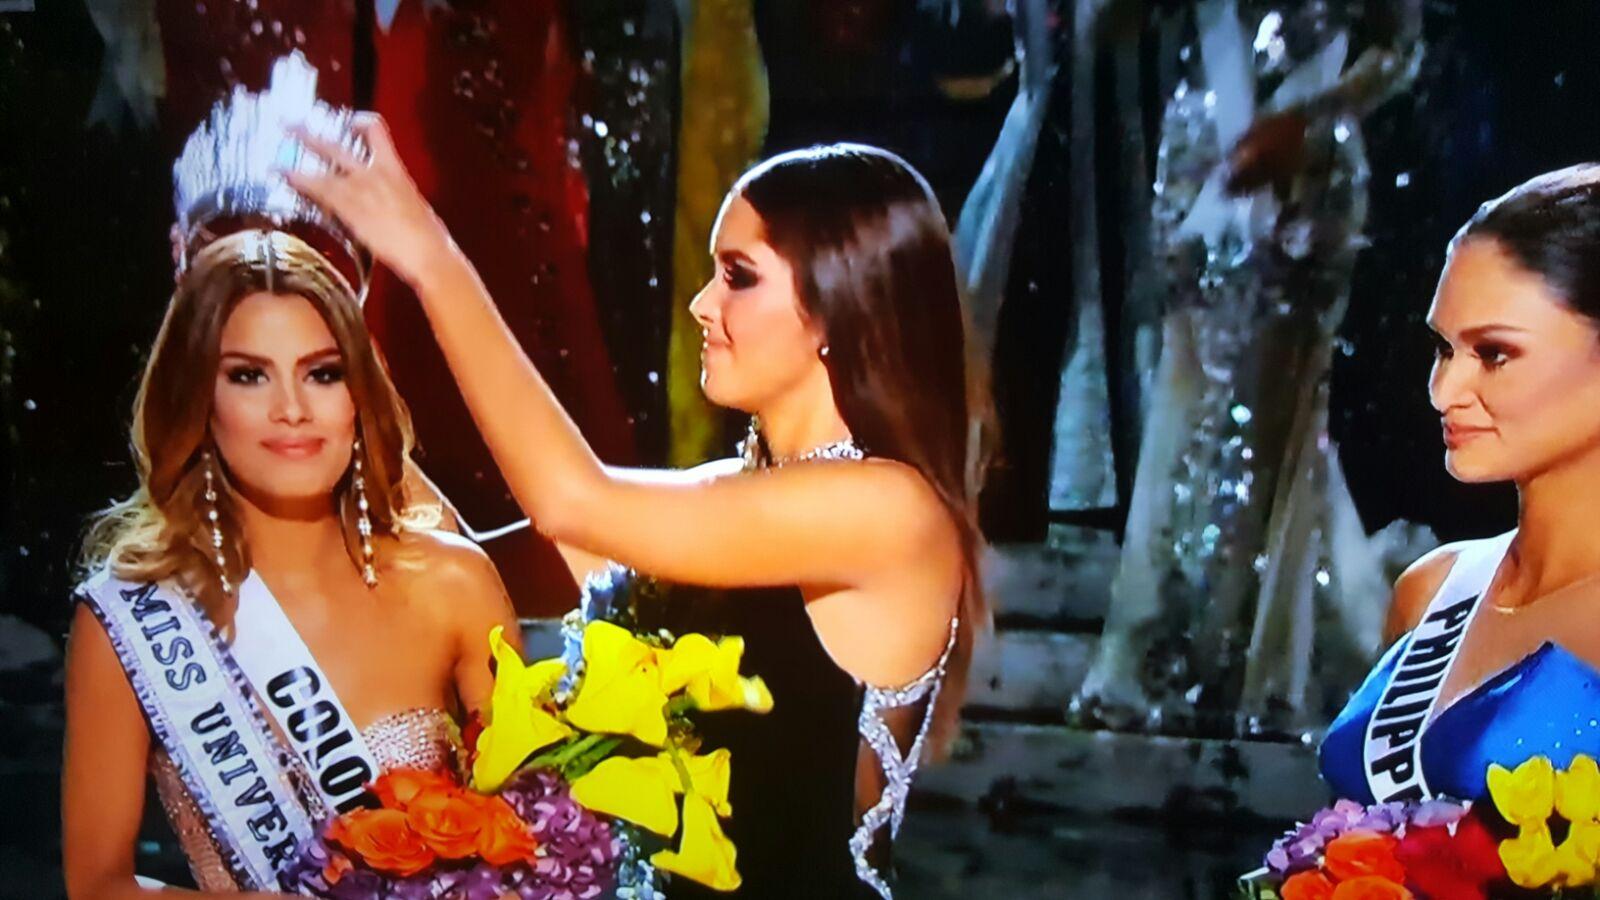 Tras error, Colombia devolvió la corona de Miss Universo